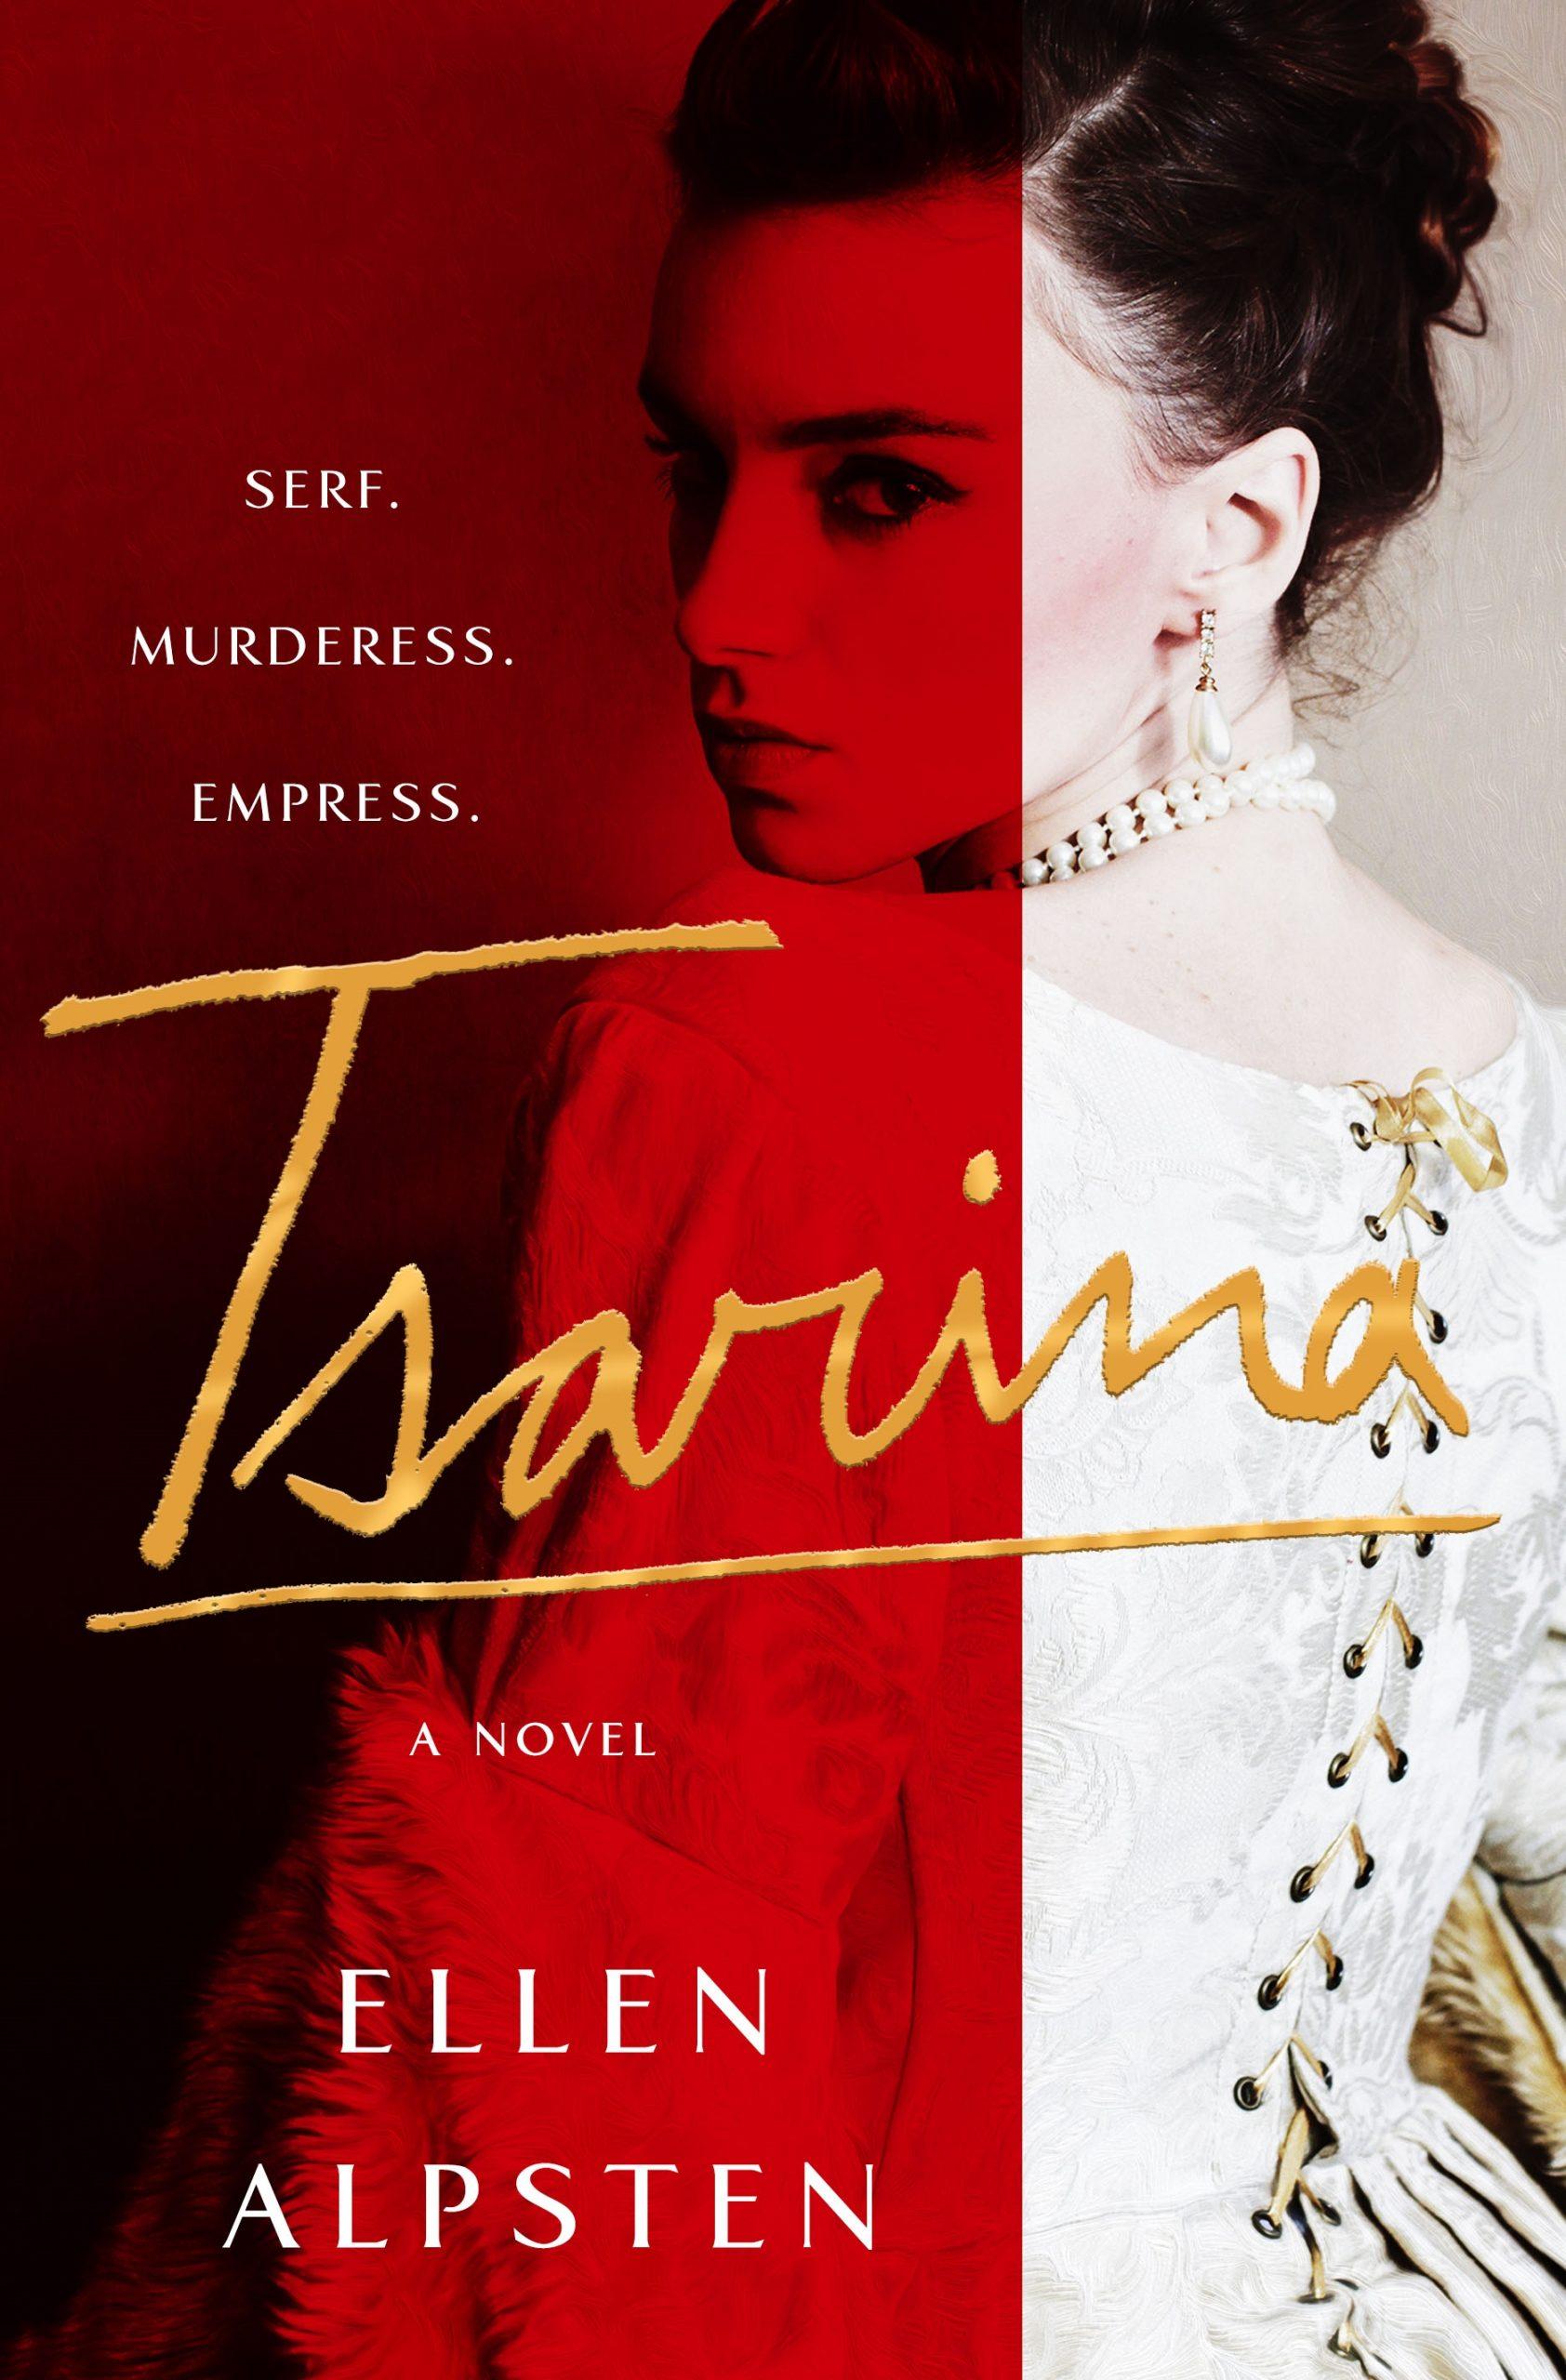 Tsarina Sweepstakes